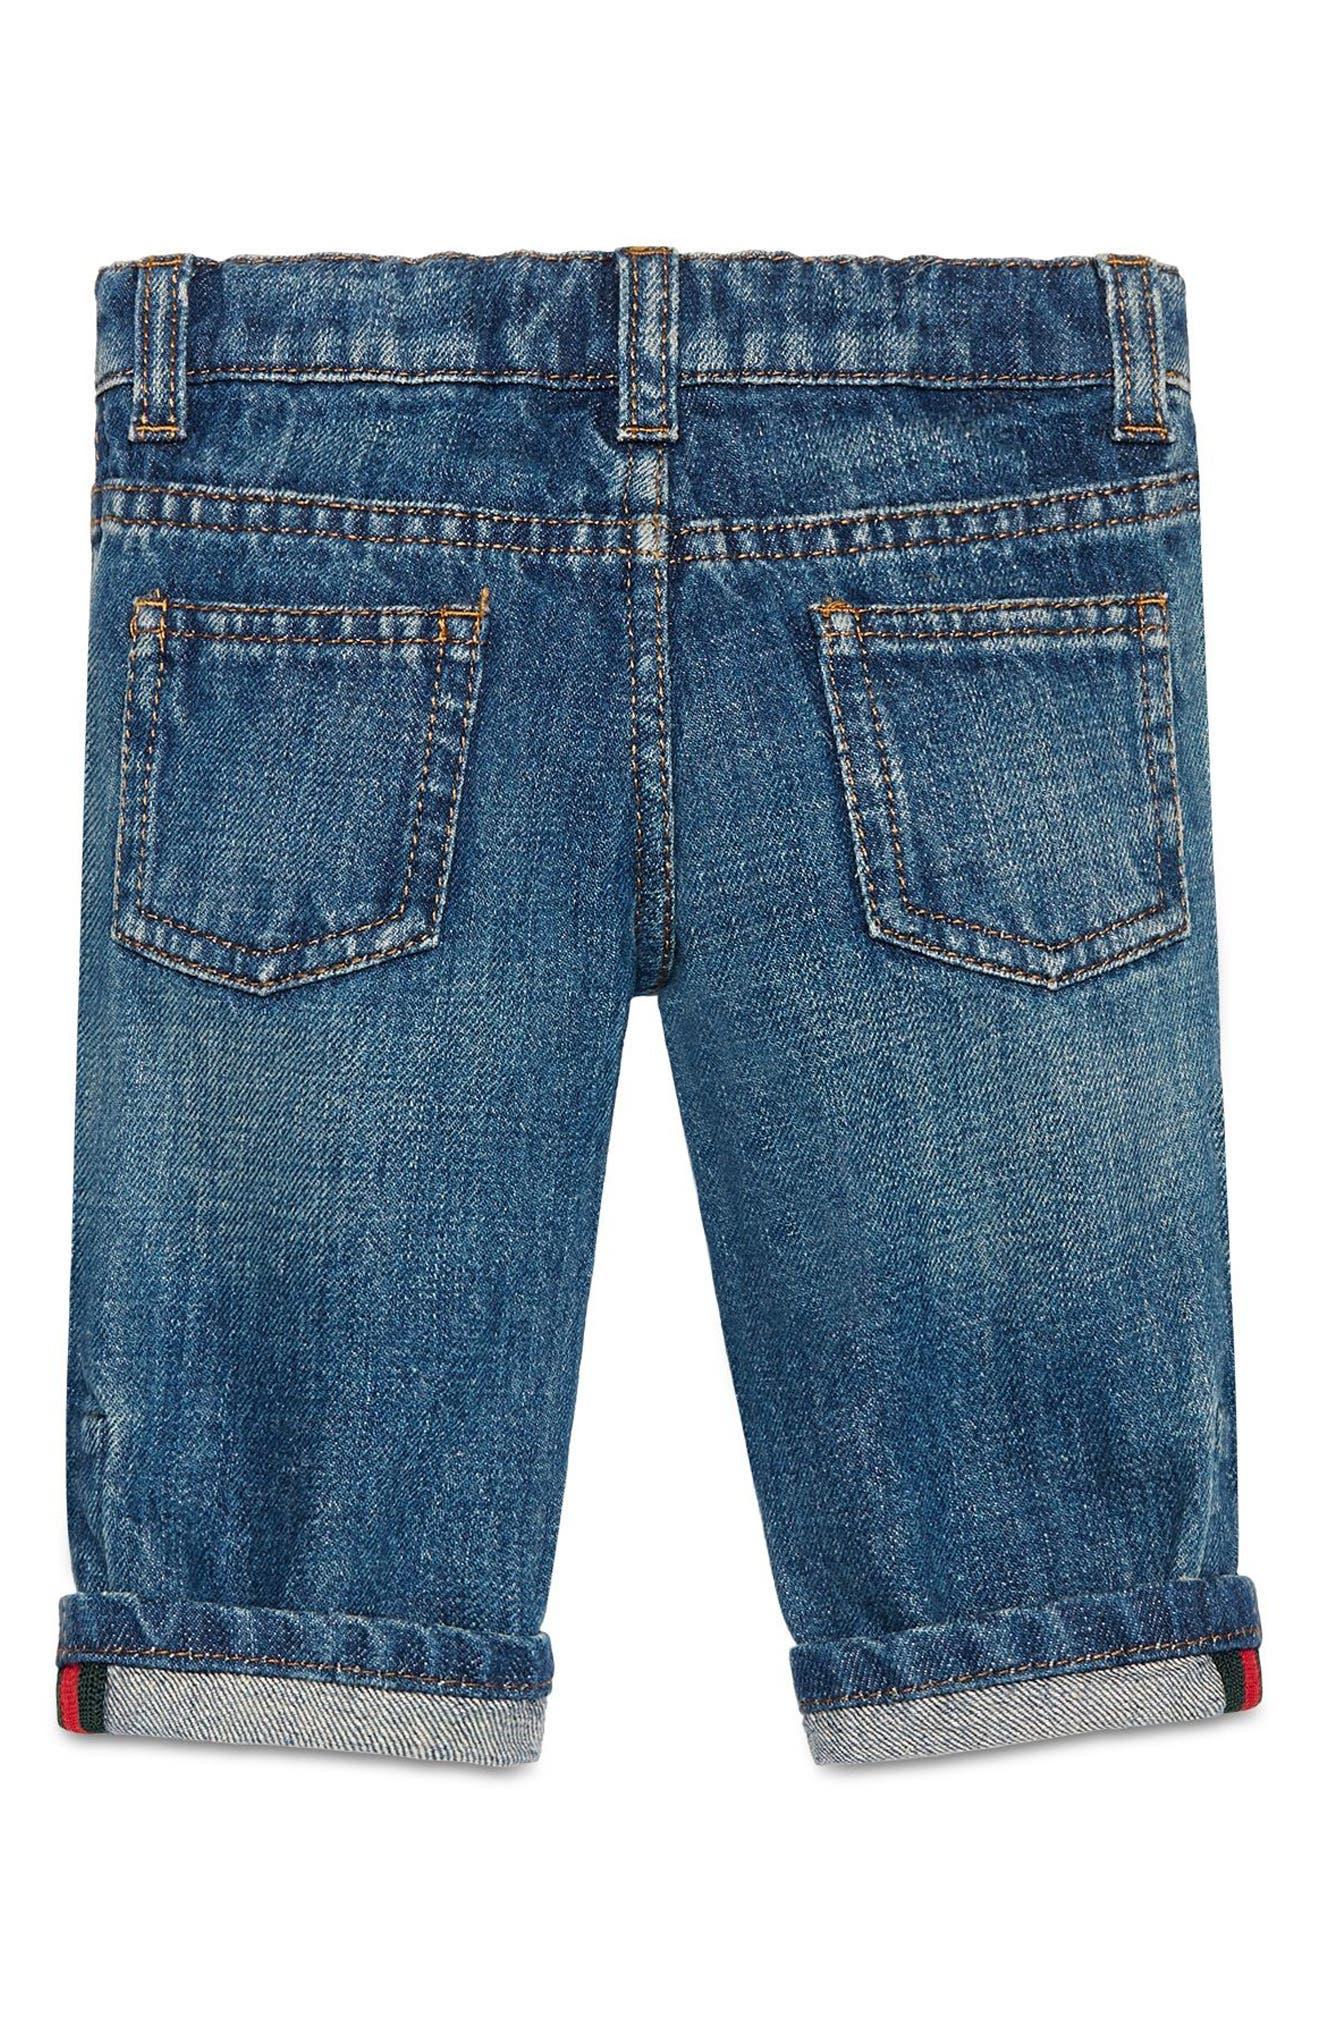 Straight Leg Jeans,                         Main,                         color, 401